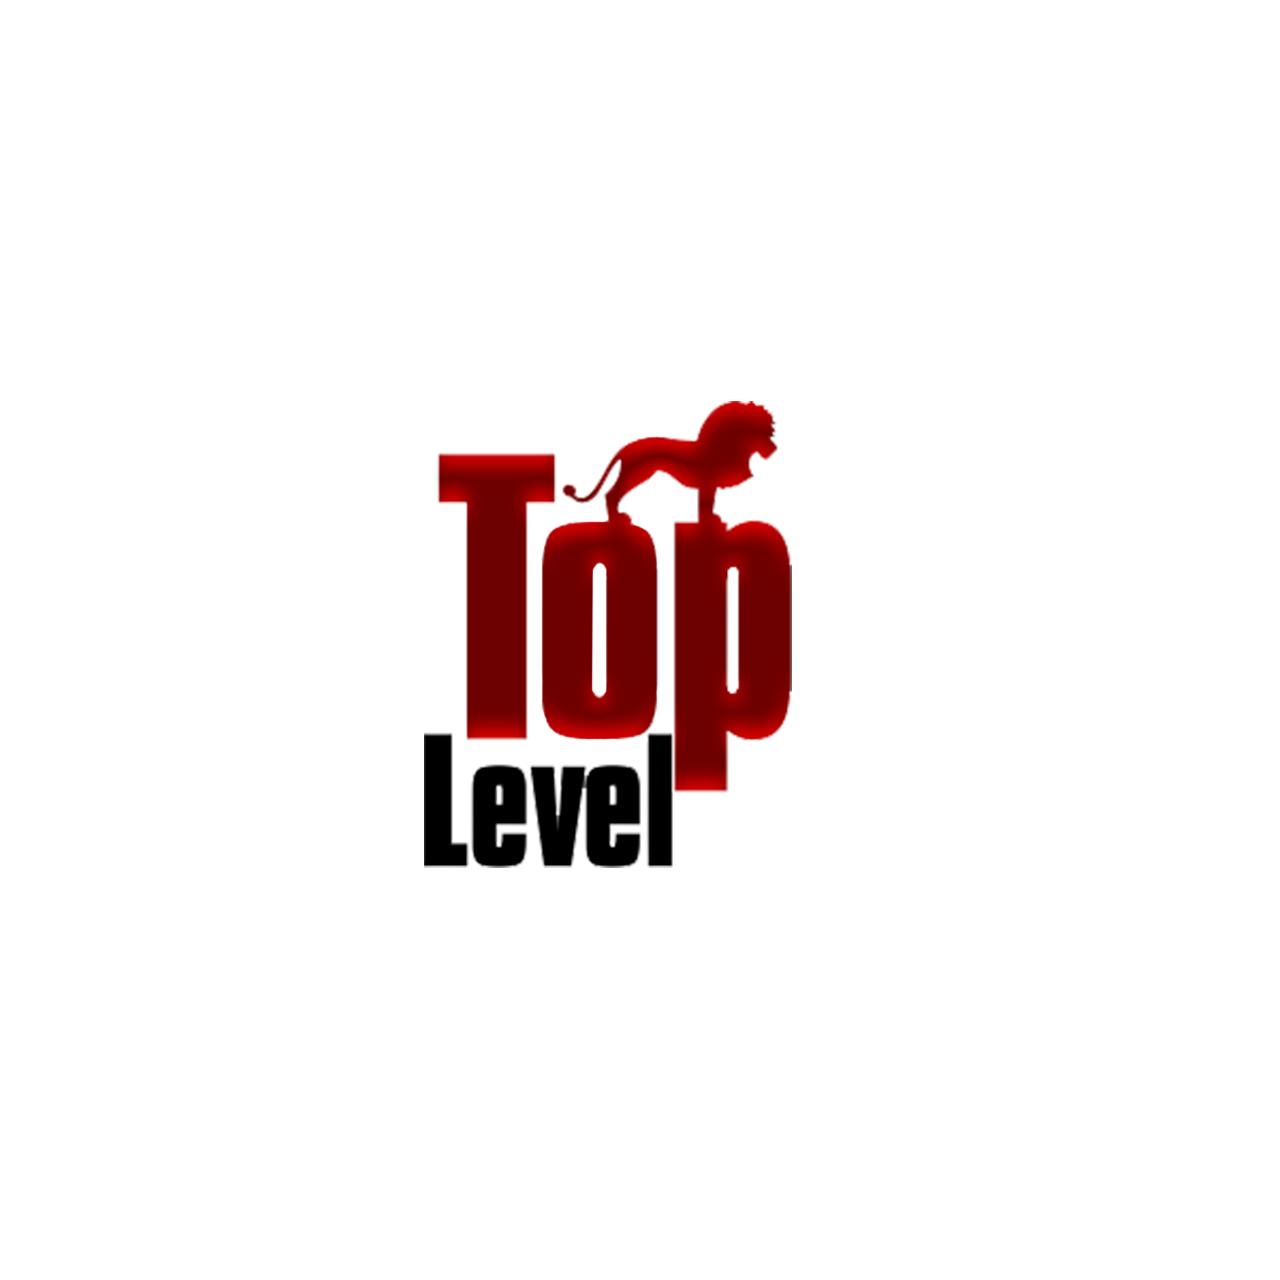 Разработка логотипа для тюнинг ателье фото f_8525f3166c498ea9.png